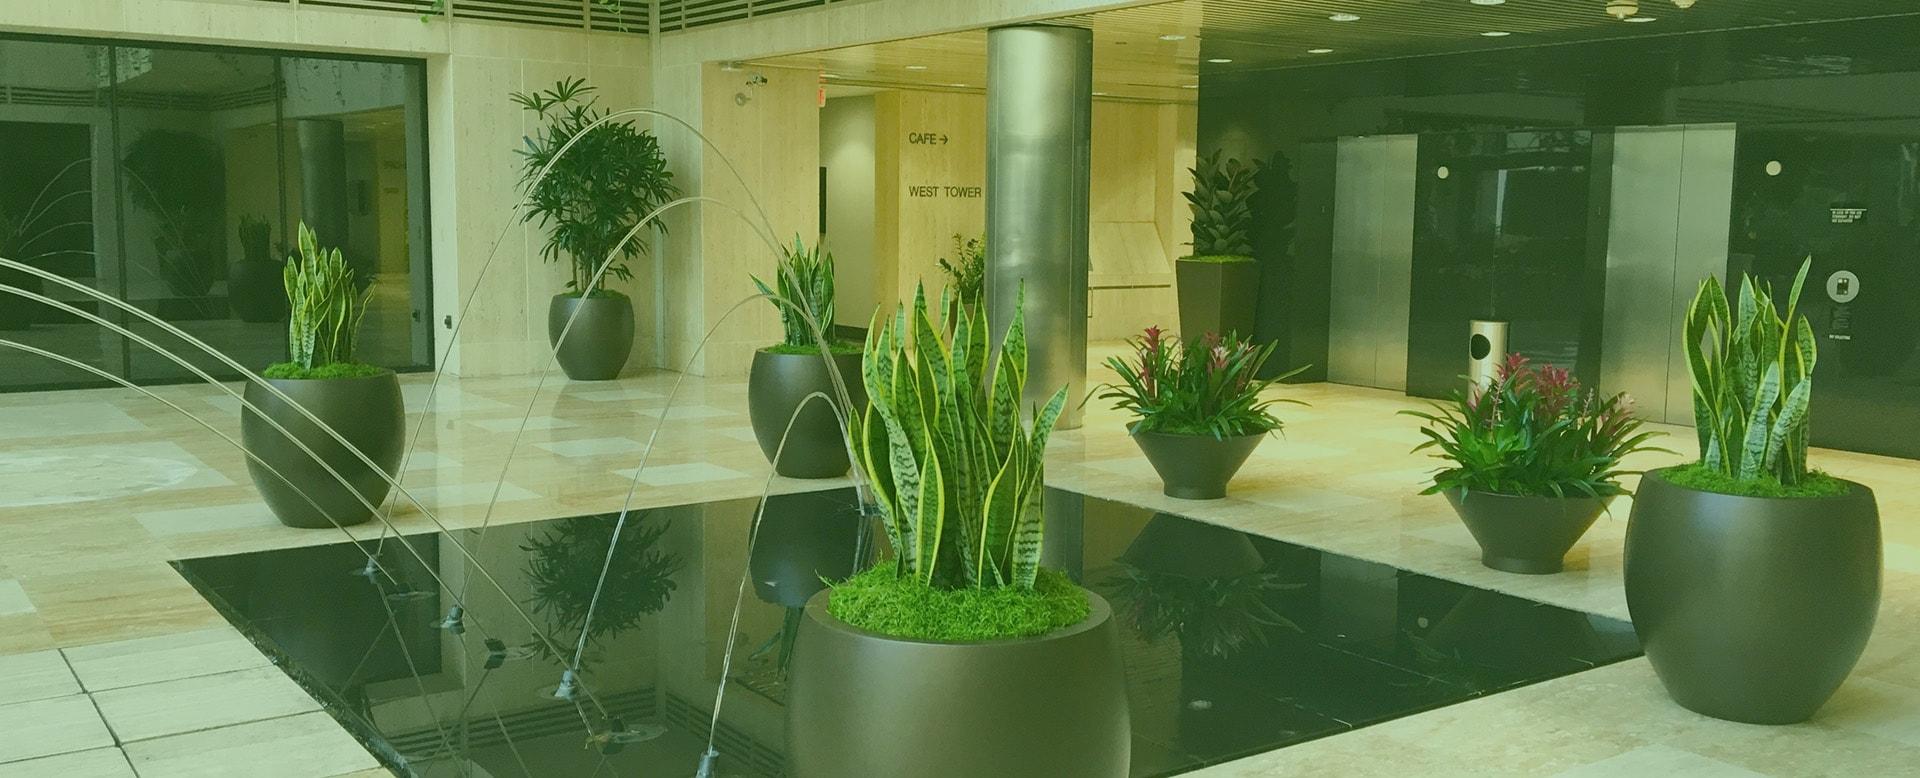 main image interior plant landscaping